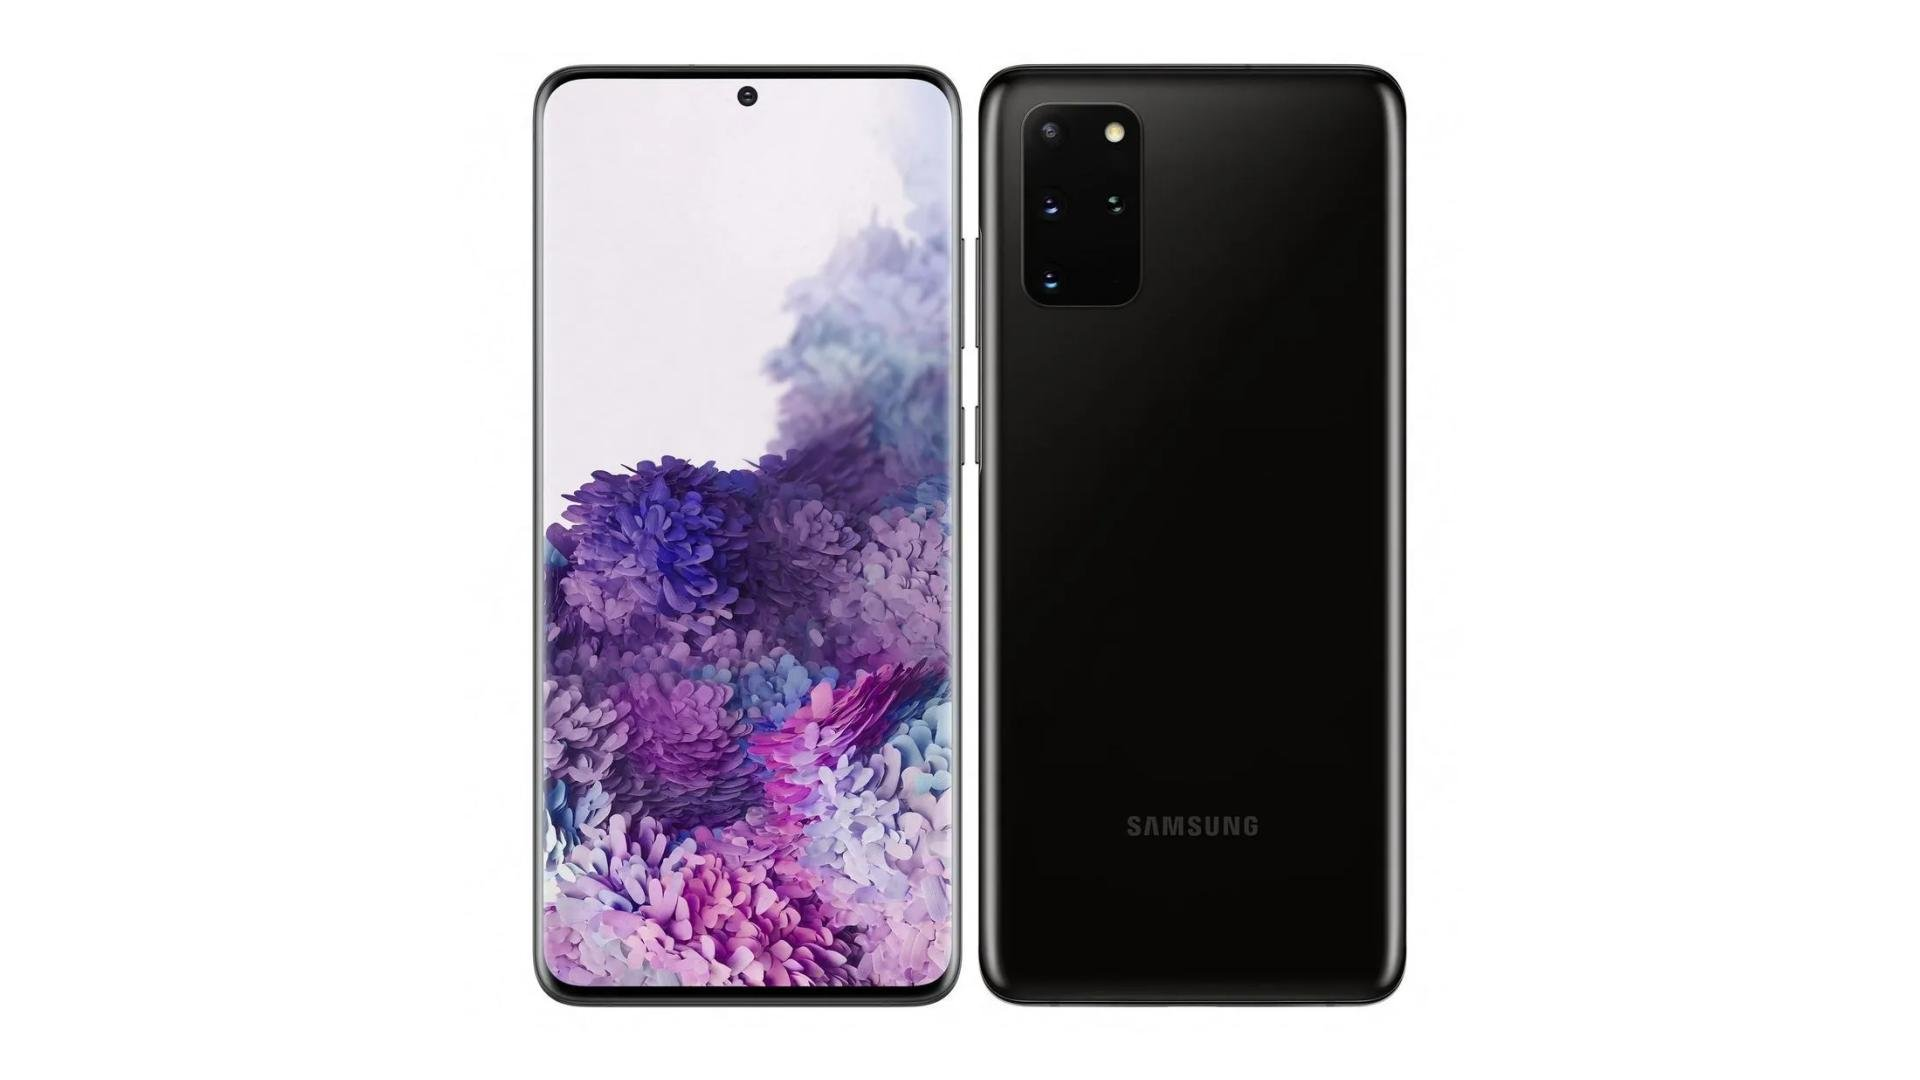 Le Samsung Galaxy S20+ 128 Go tombe à 579 euros